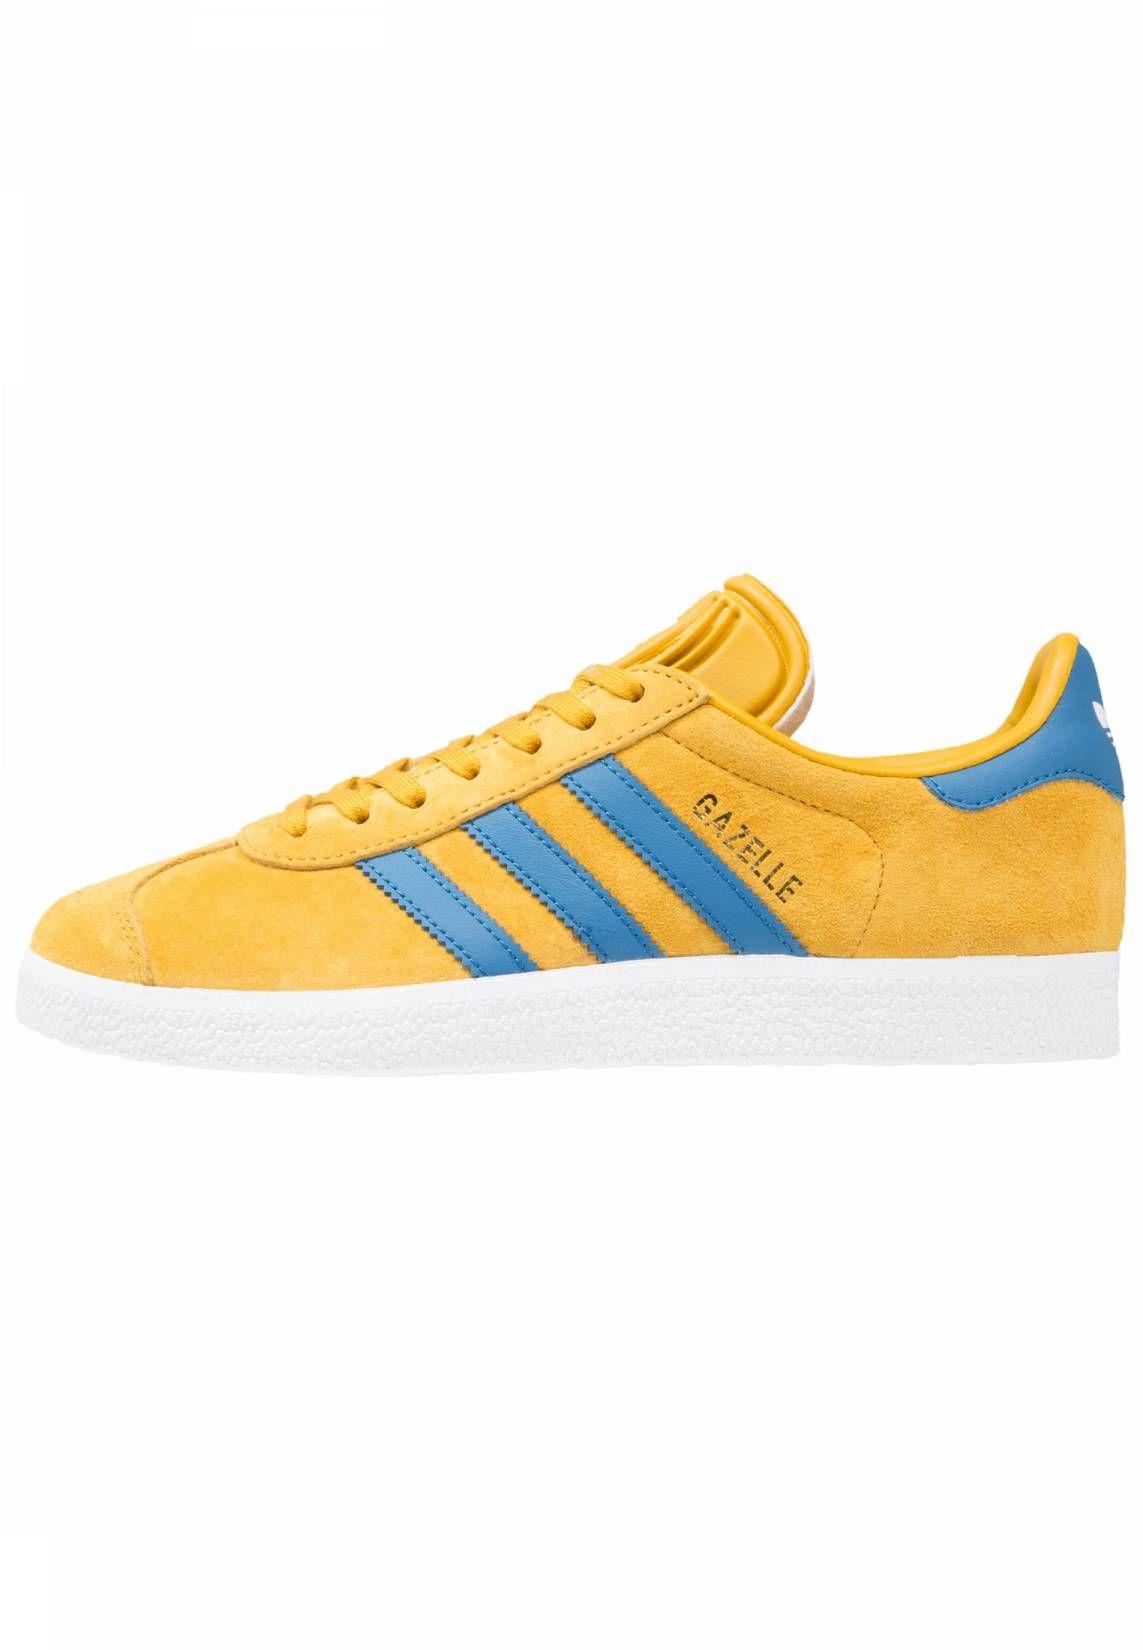 adidas Originals. GAZELLE Trainers yellowcore blue